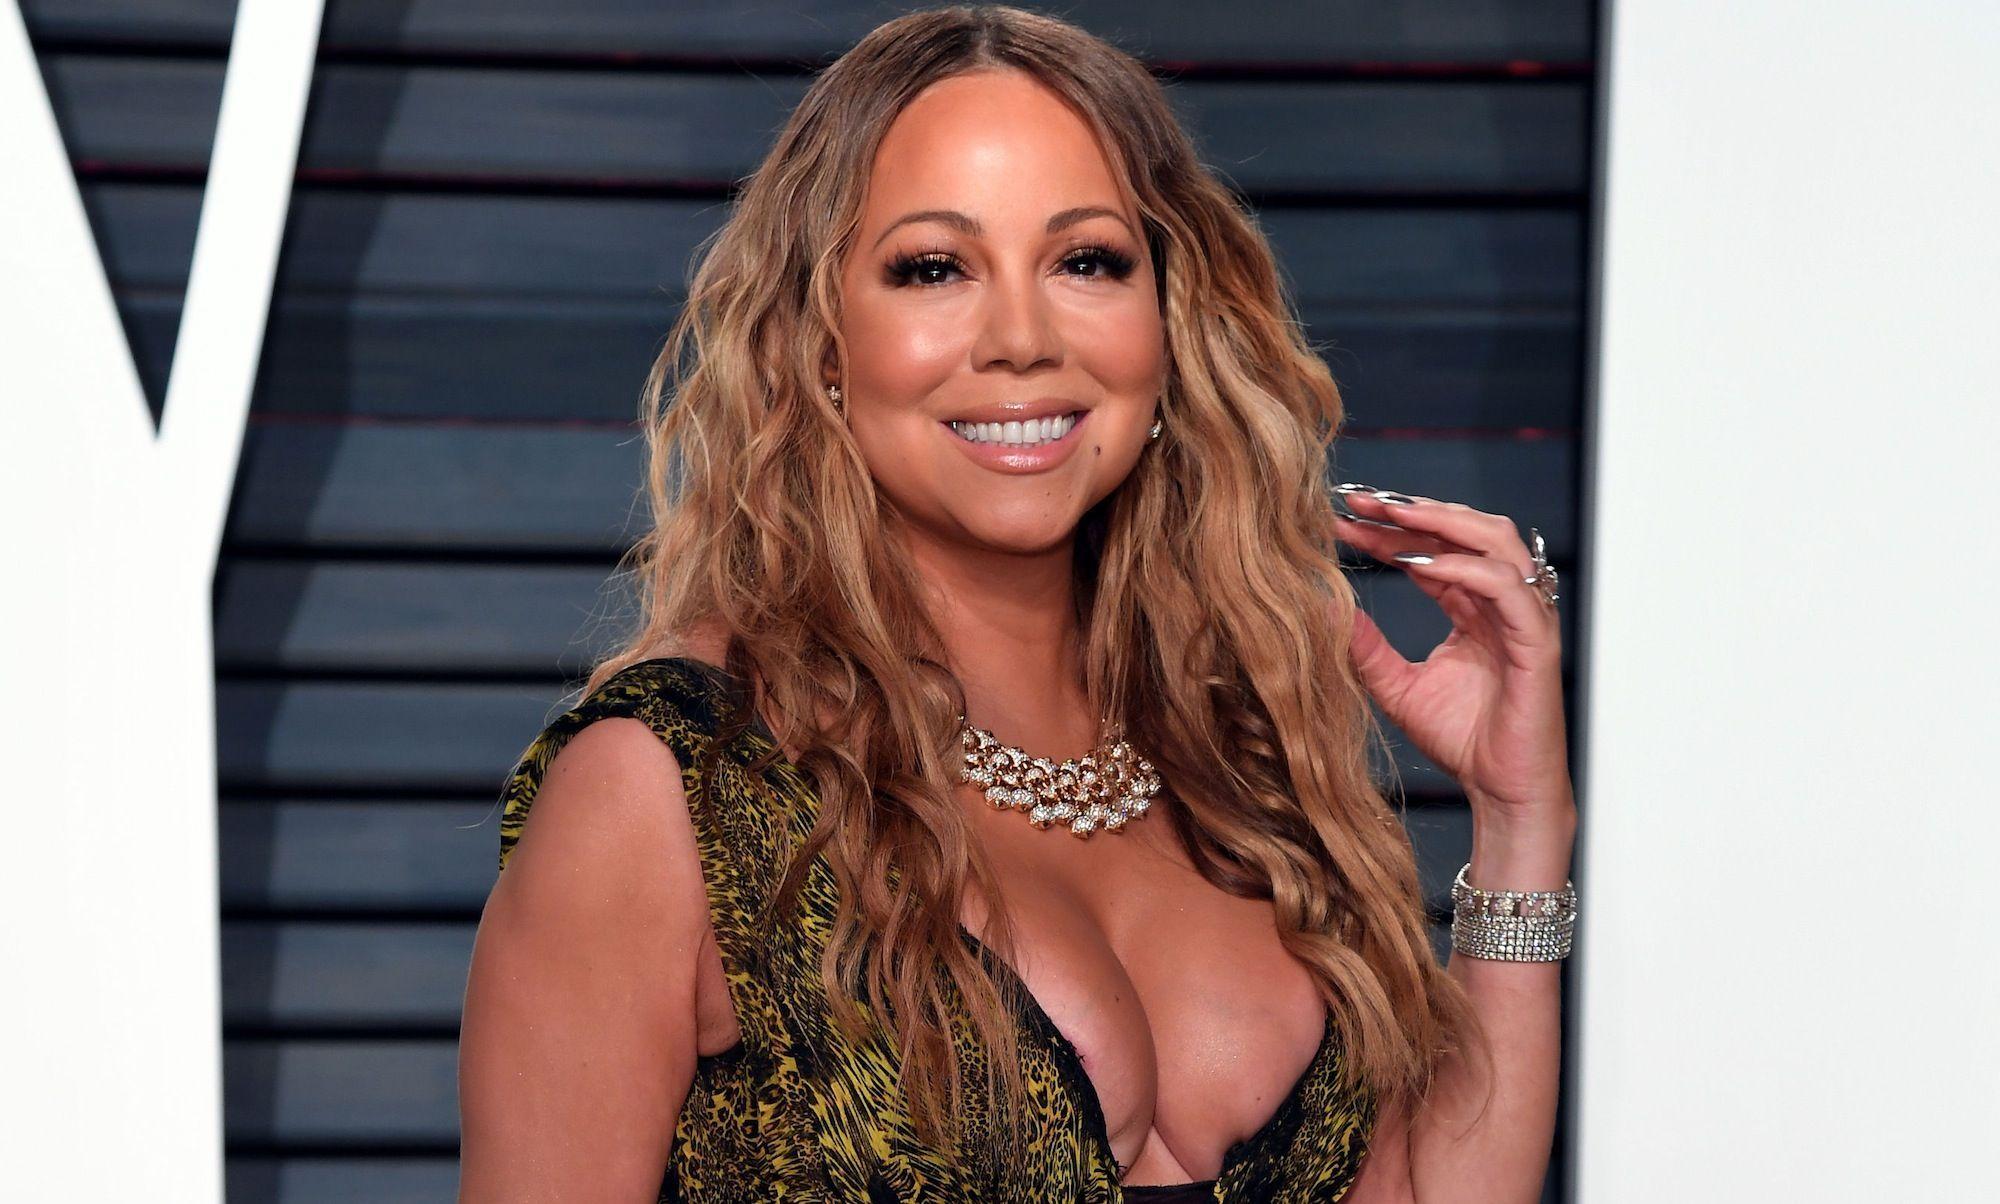 Harcèlement Carey Par De Sa Mariah Sexuel Manageuse Accusée EDHYIW29